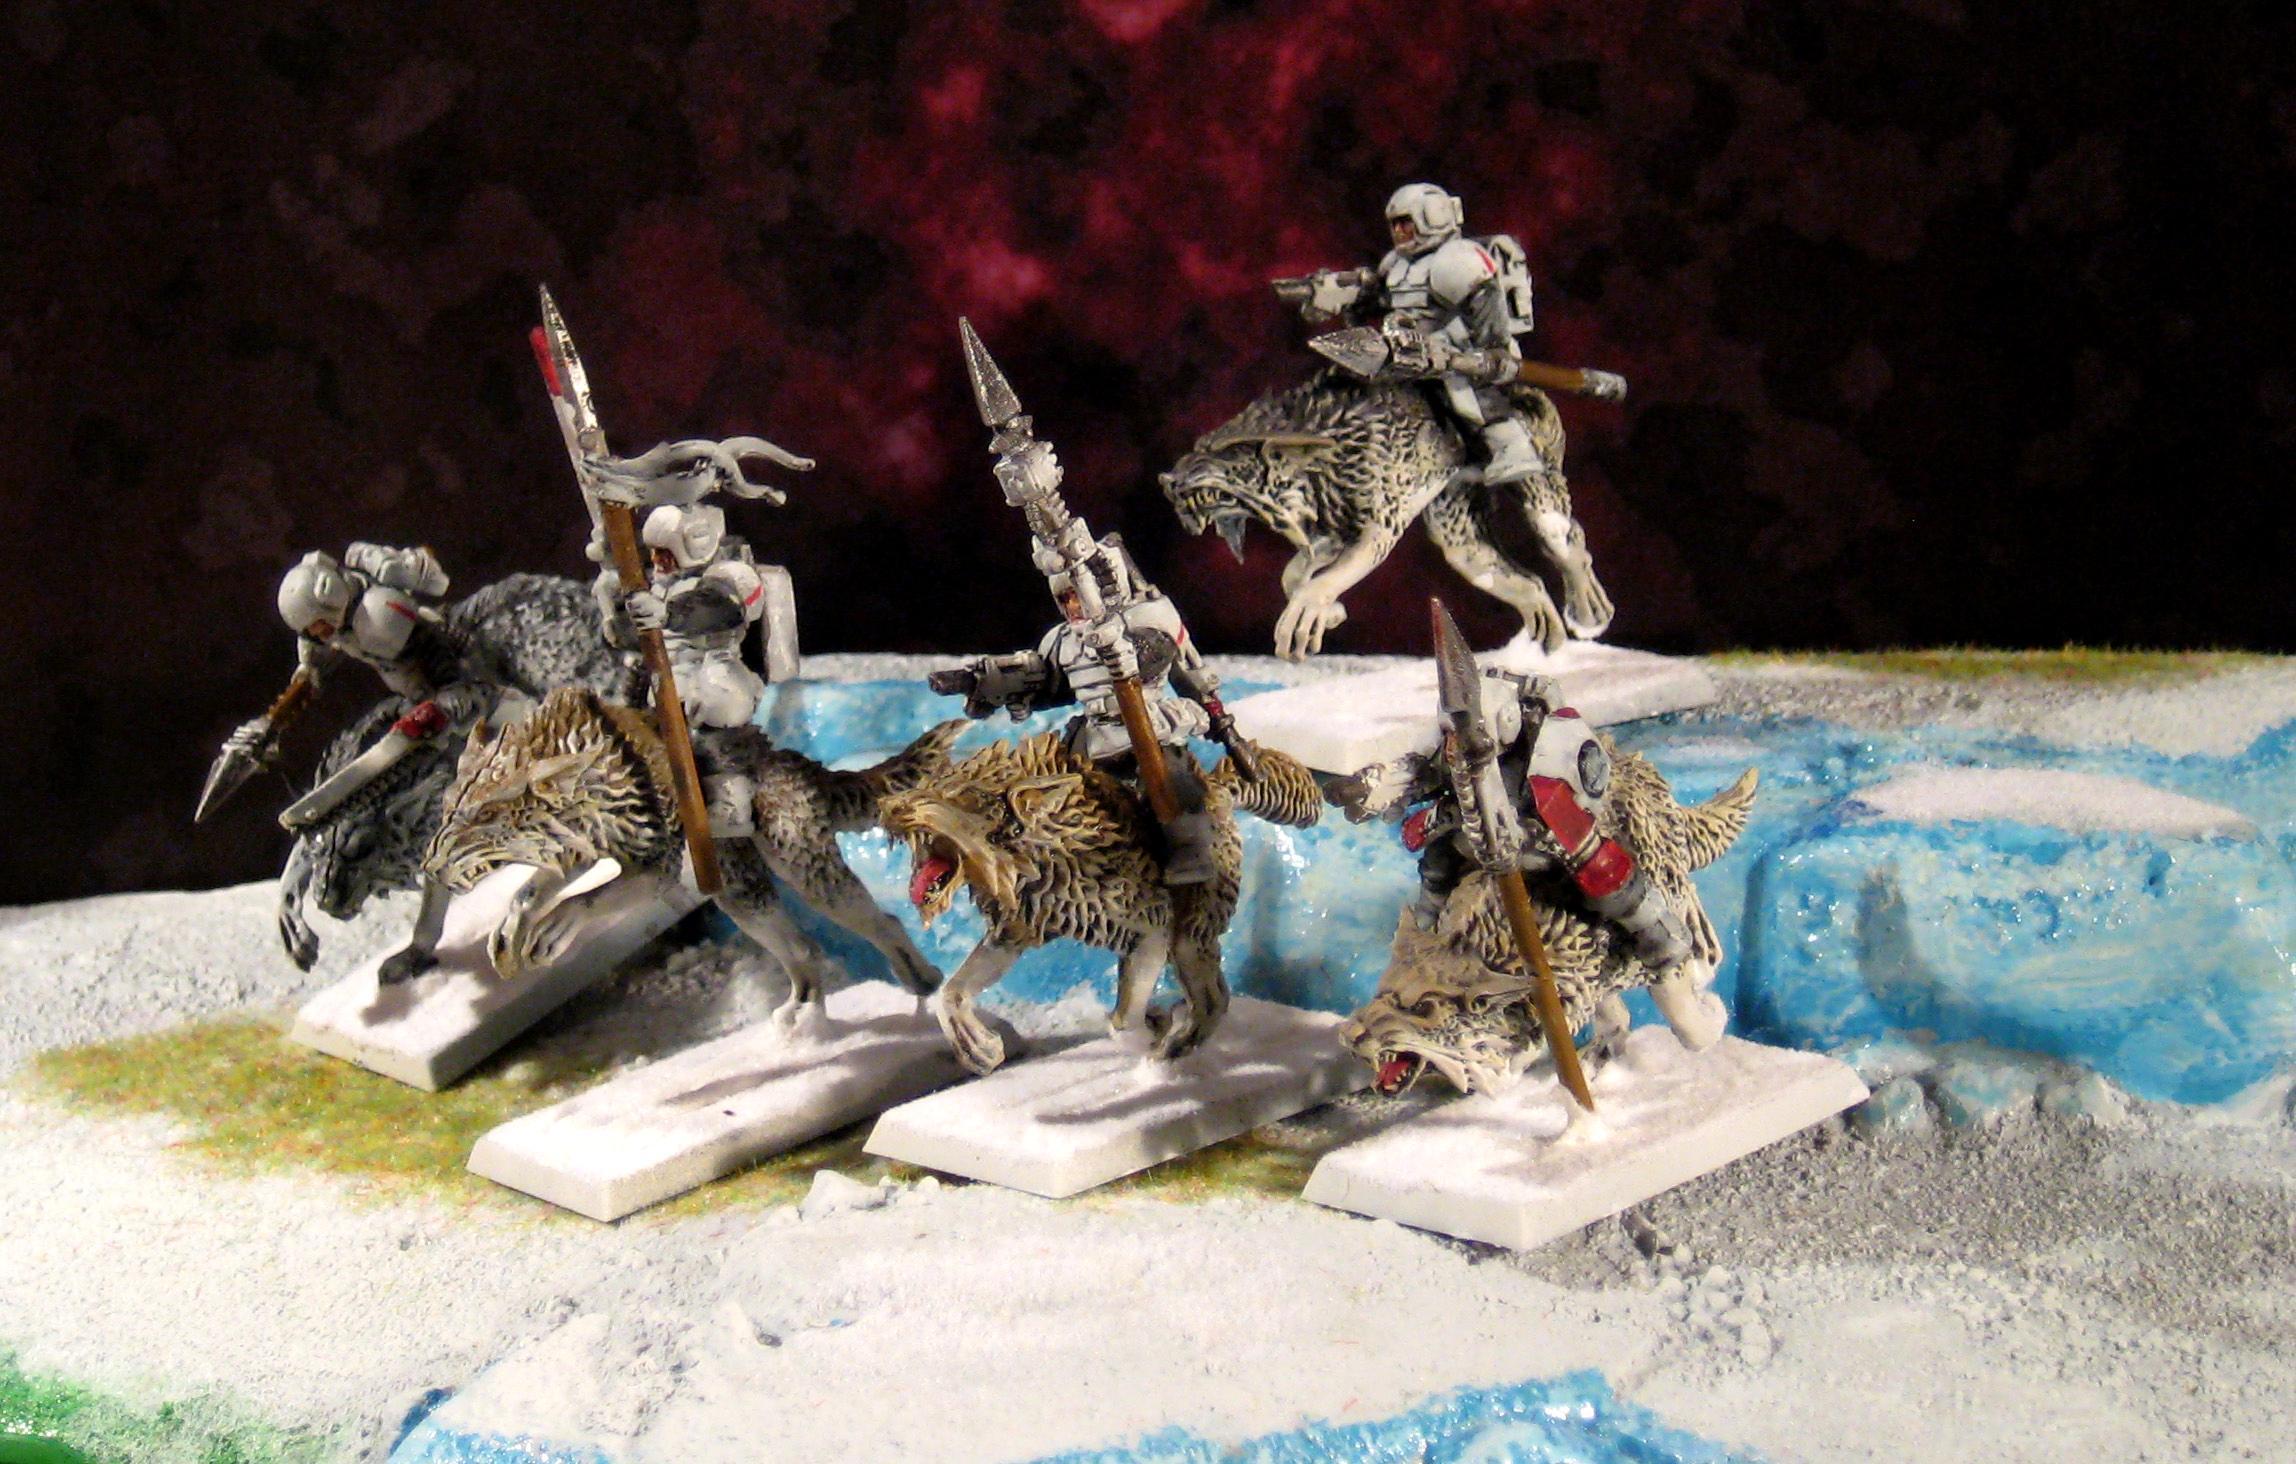 Cadians, Conversion, Empire, Fenrisian Wolves, Gue'vesa, Guevesa, Imperial Guard, Kroot, Rough Riders, Snow, Tau, Tau Empire, White, Wolves